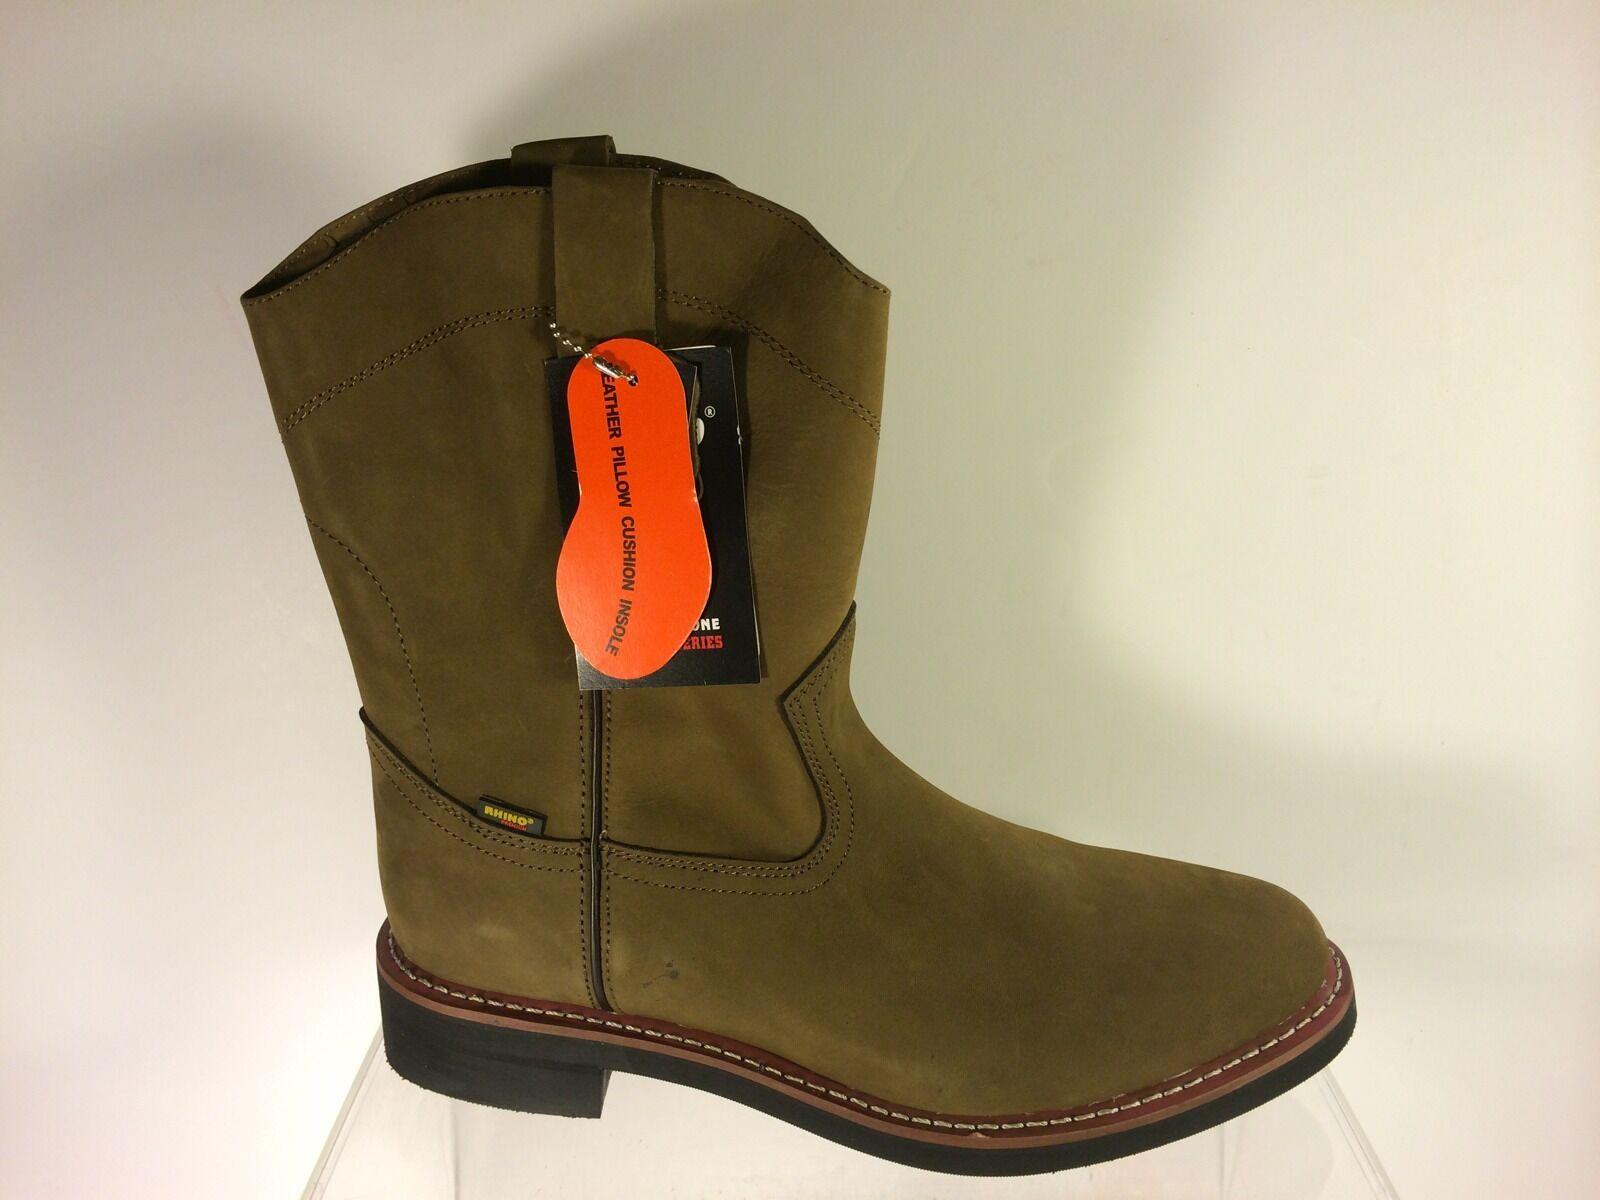 Serie de vaquero occidental Rhino Premium Wellington botas para hombre 12